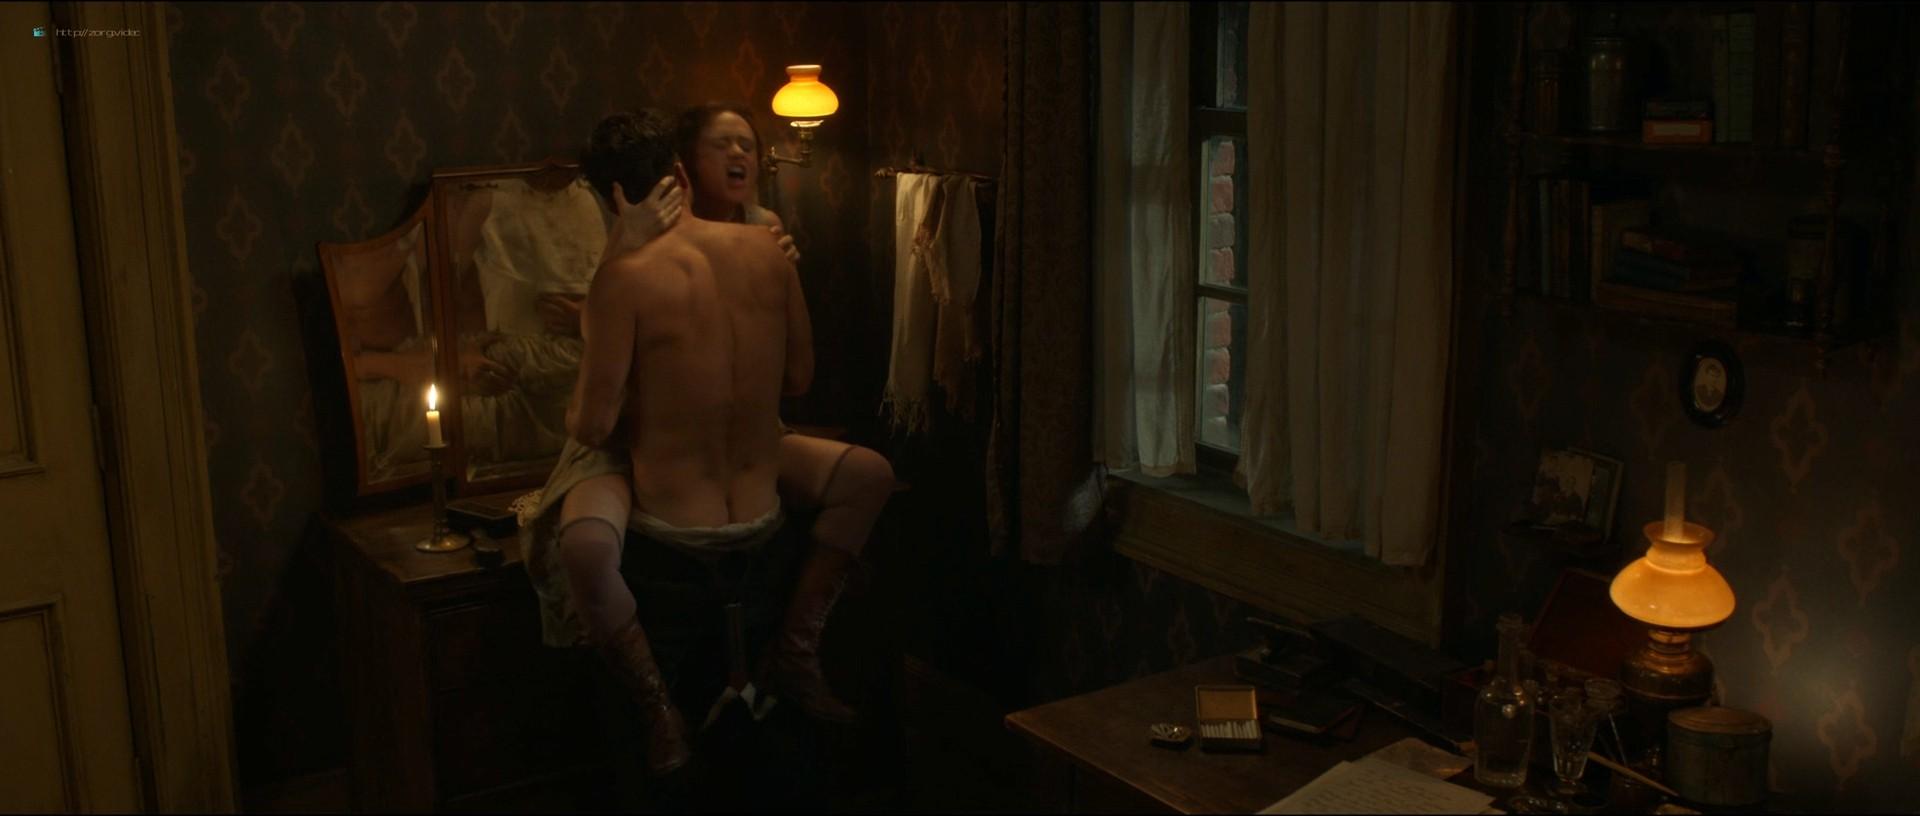 Maeve Dermody nude sex Karla Crome nude too - Carnival Row (2019) s1e1 HD 1080p (9)